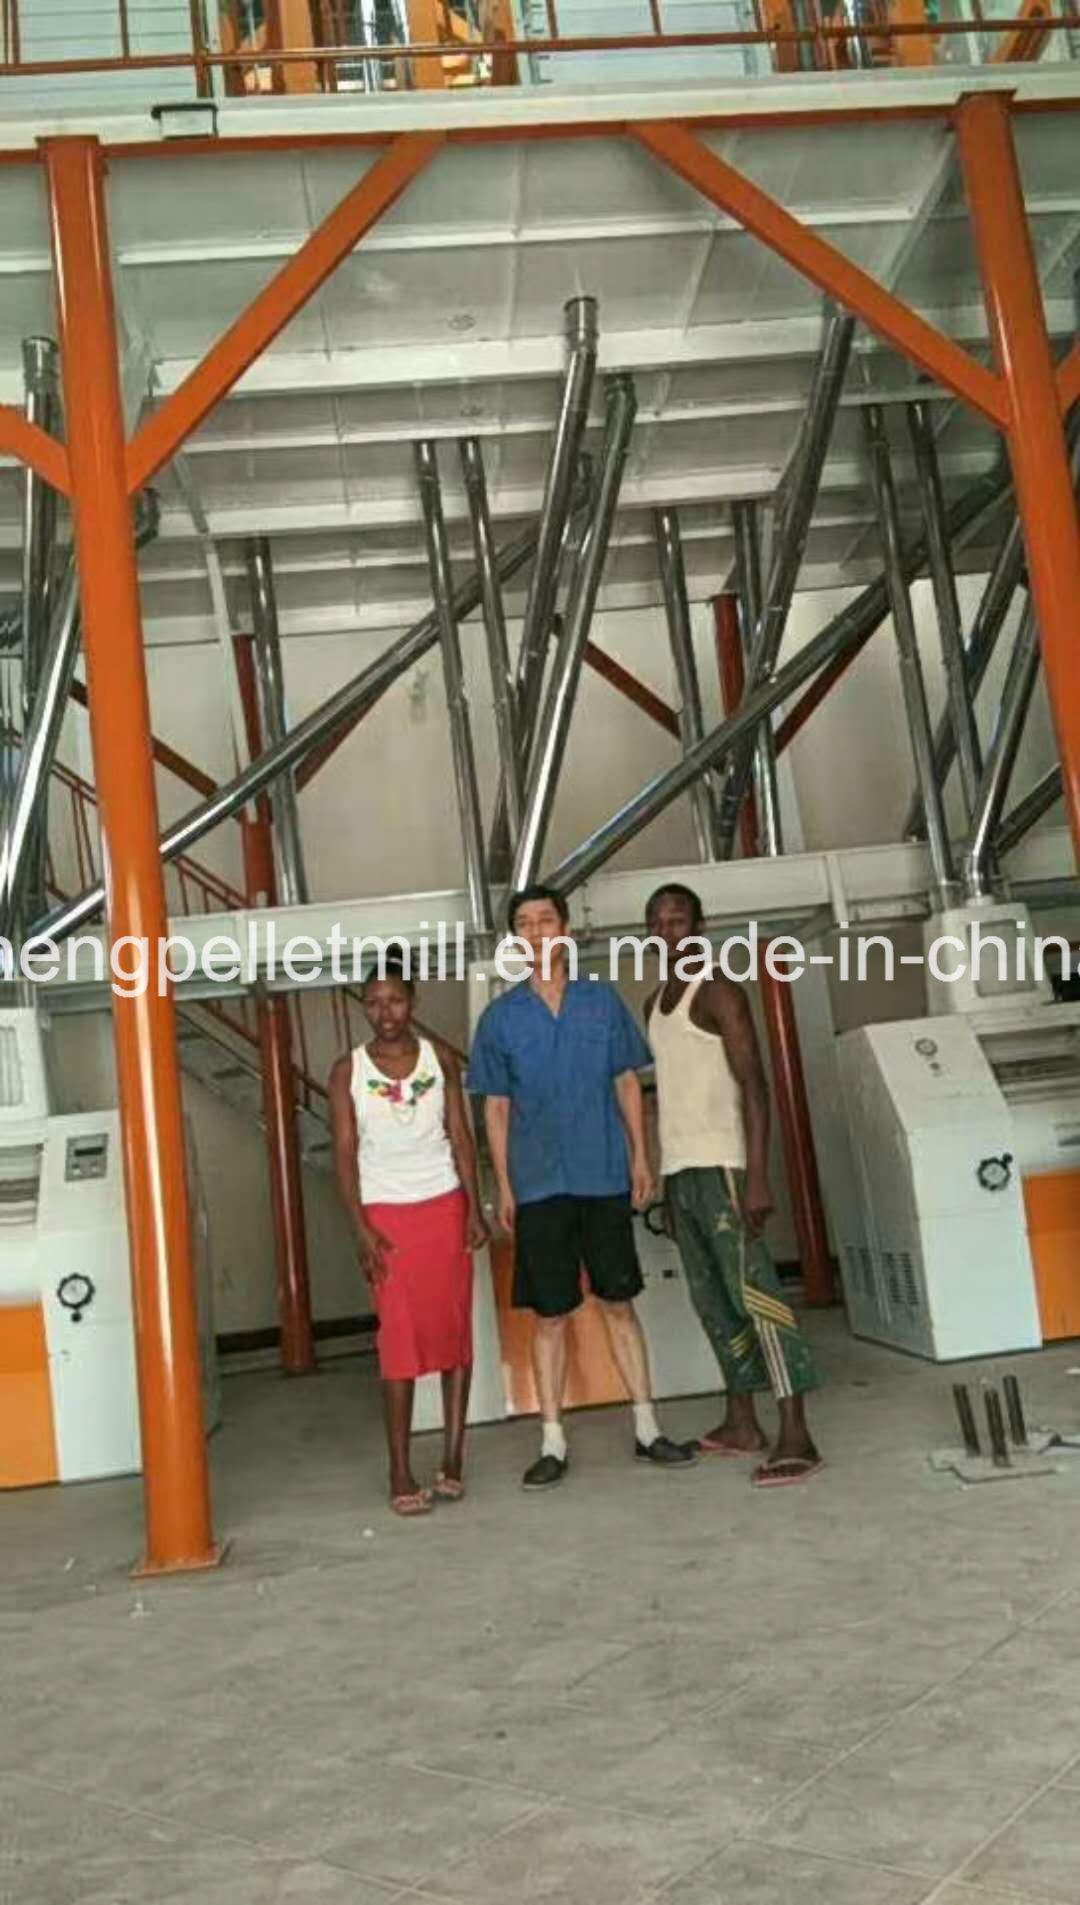 Africa Wheat Maize Corn Flour Milling Plant Complete Line